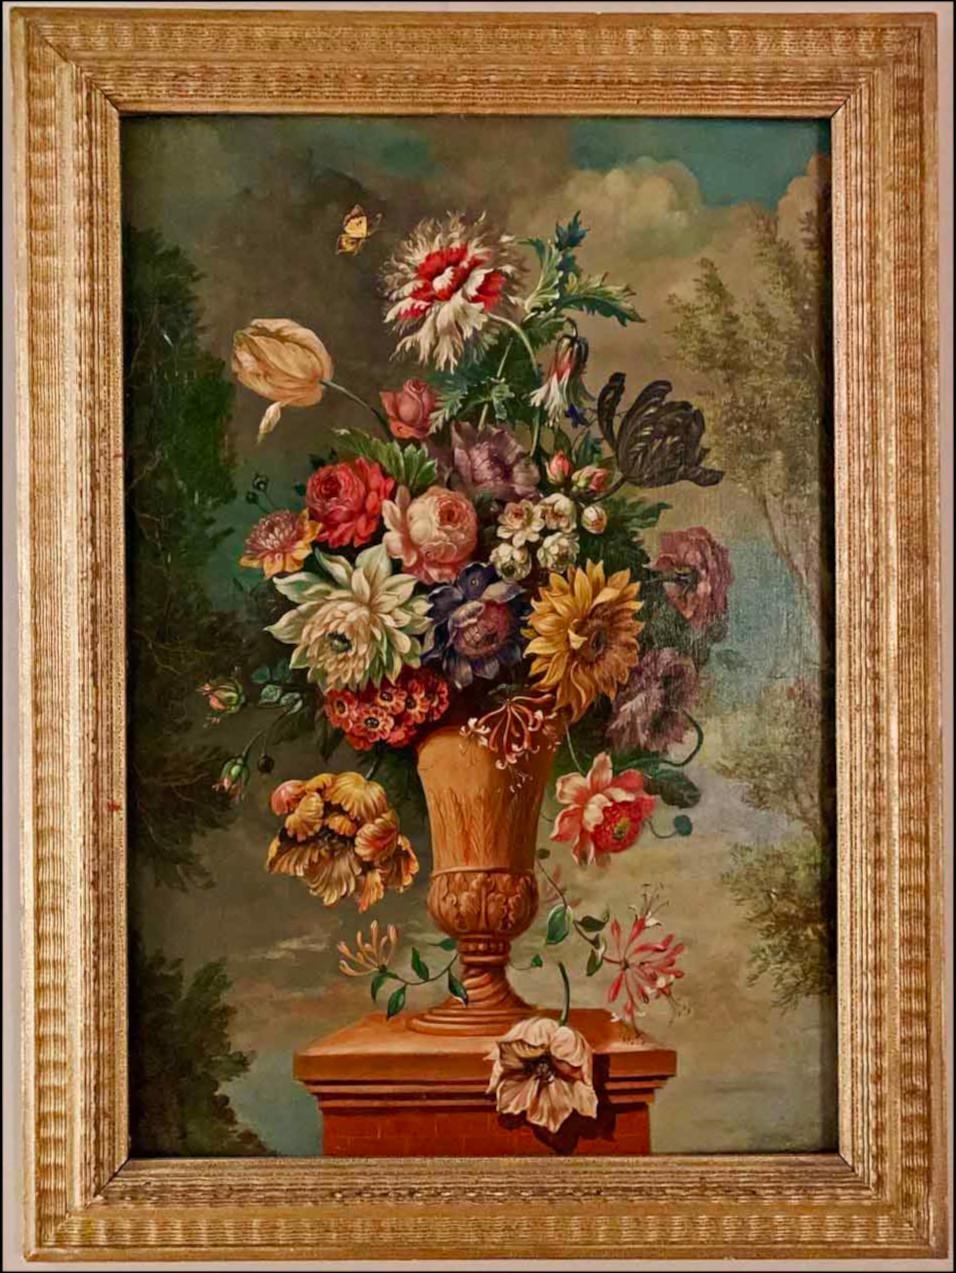 19th Century Flemish Floral Still Life, Oil on Canvas on Panel